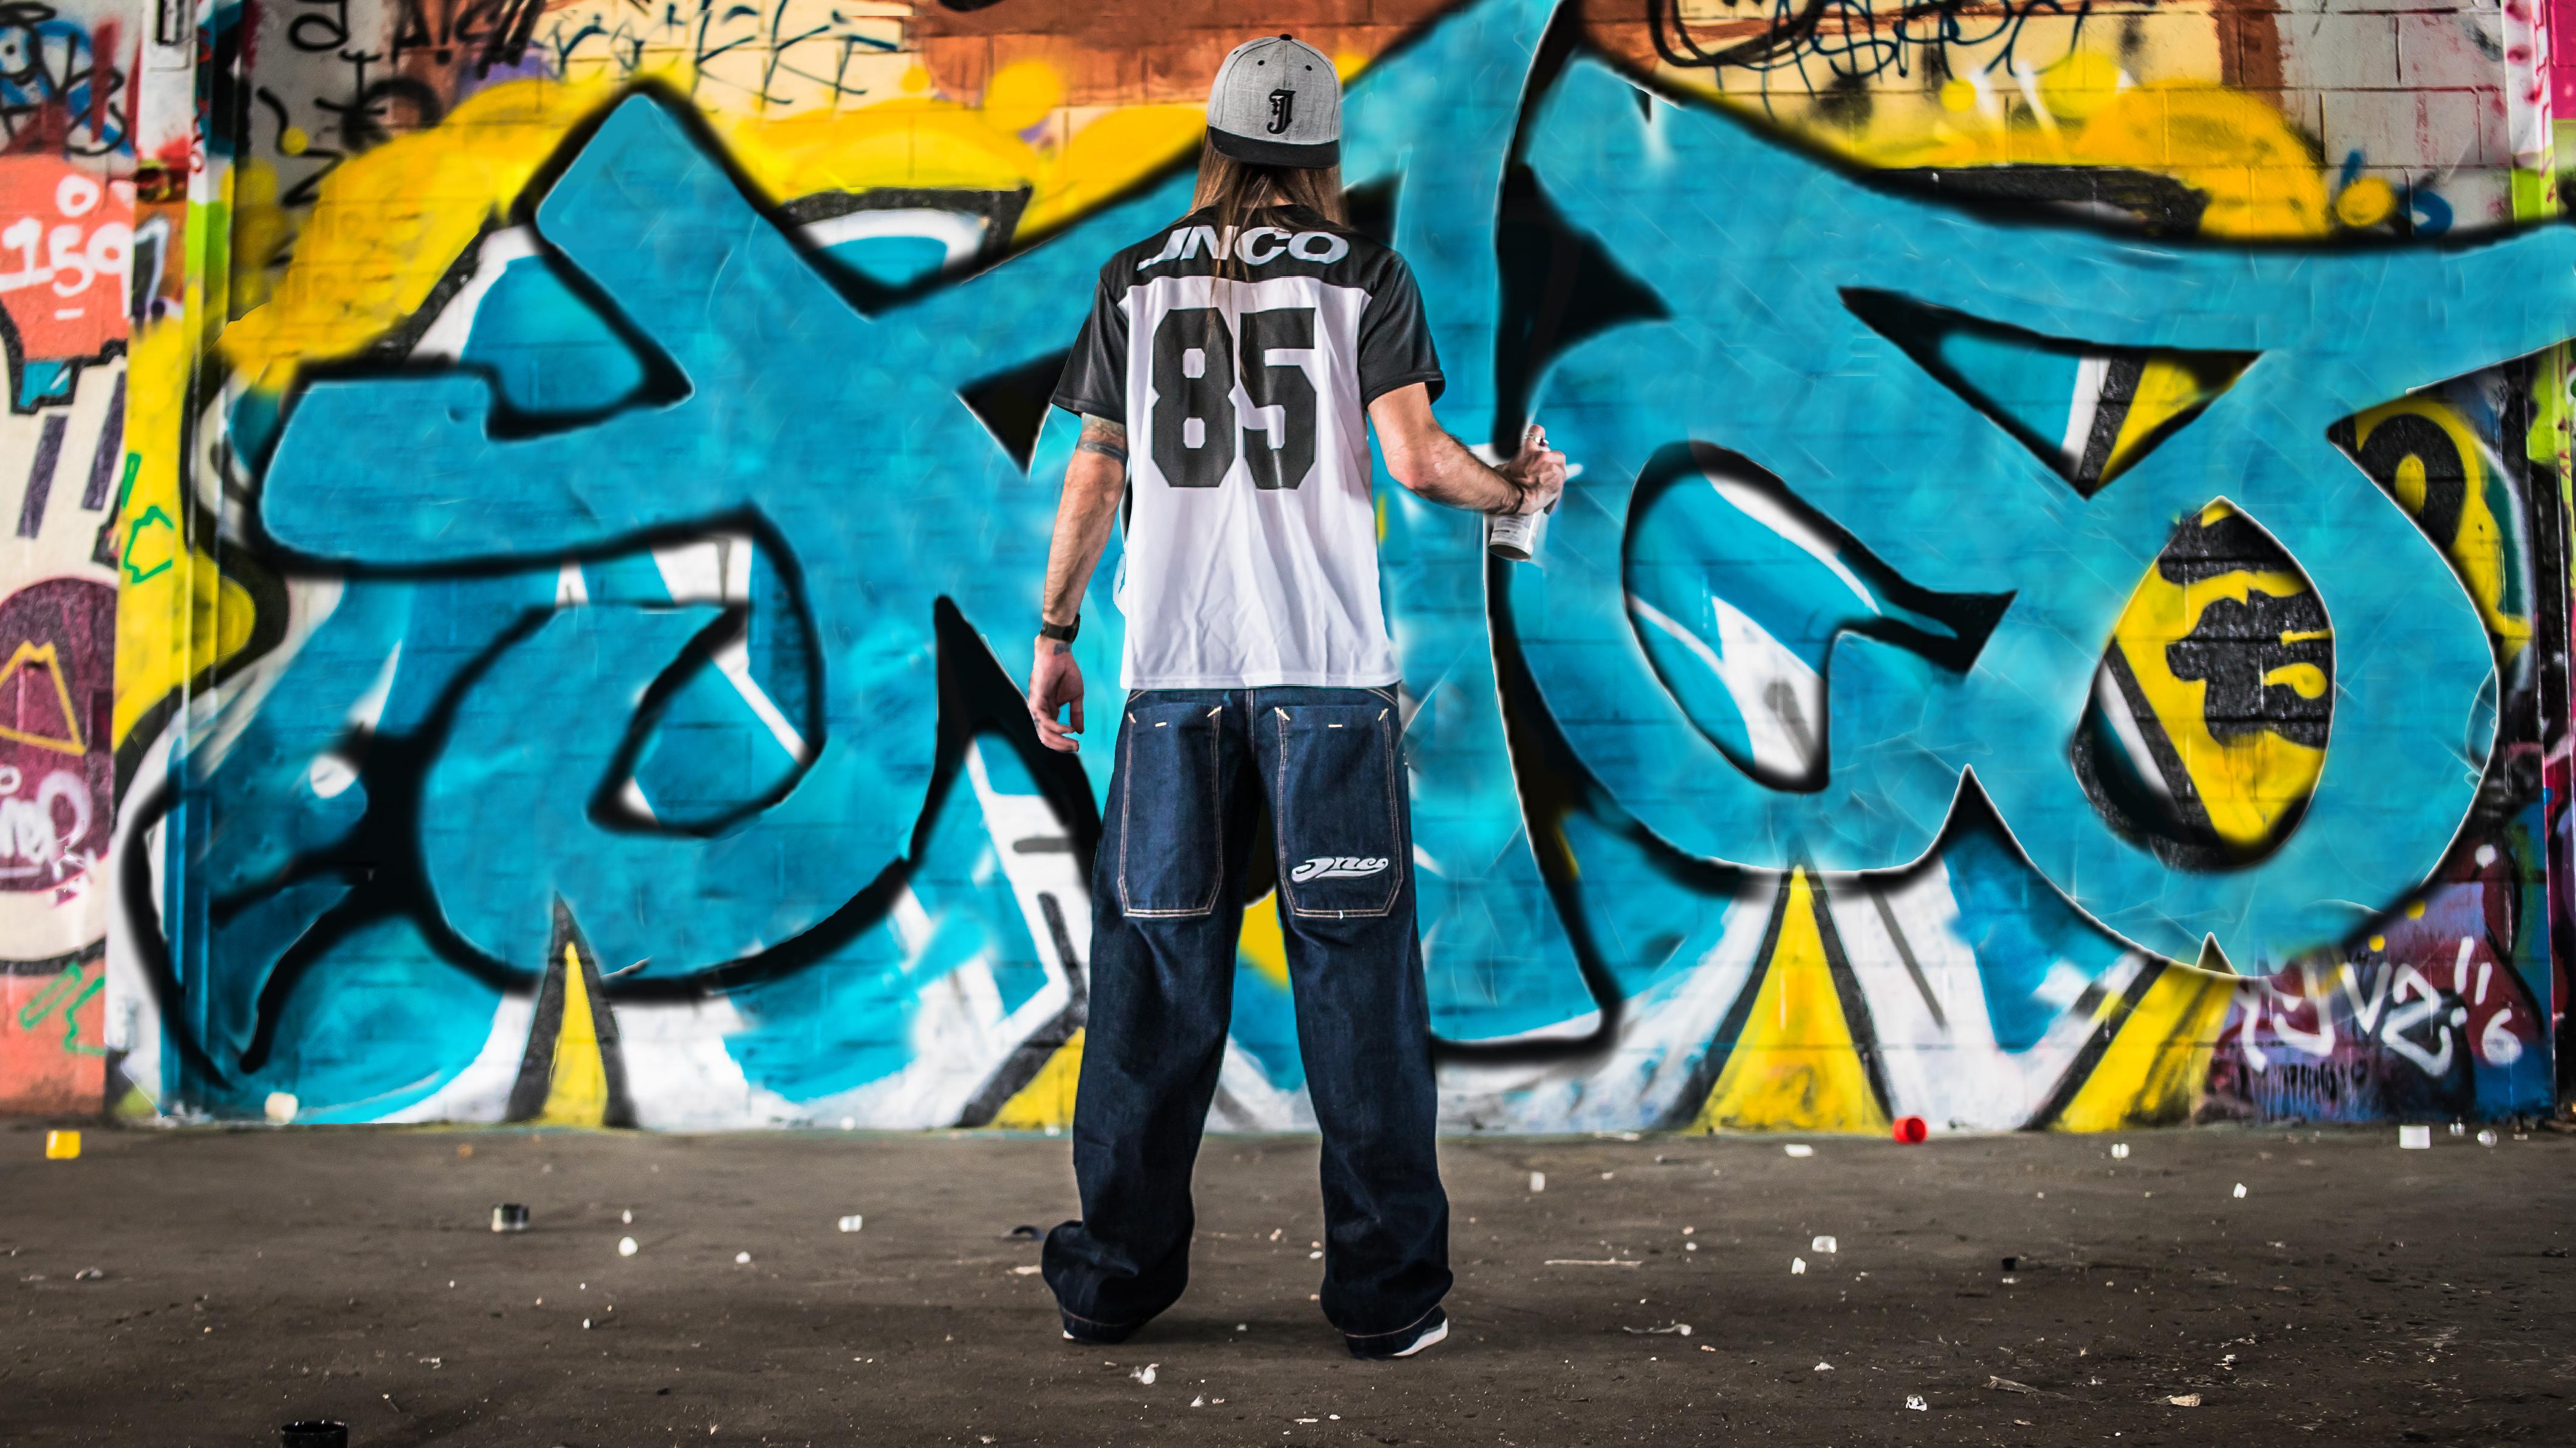 JNCO Graffiti